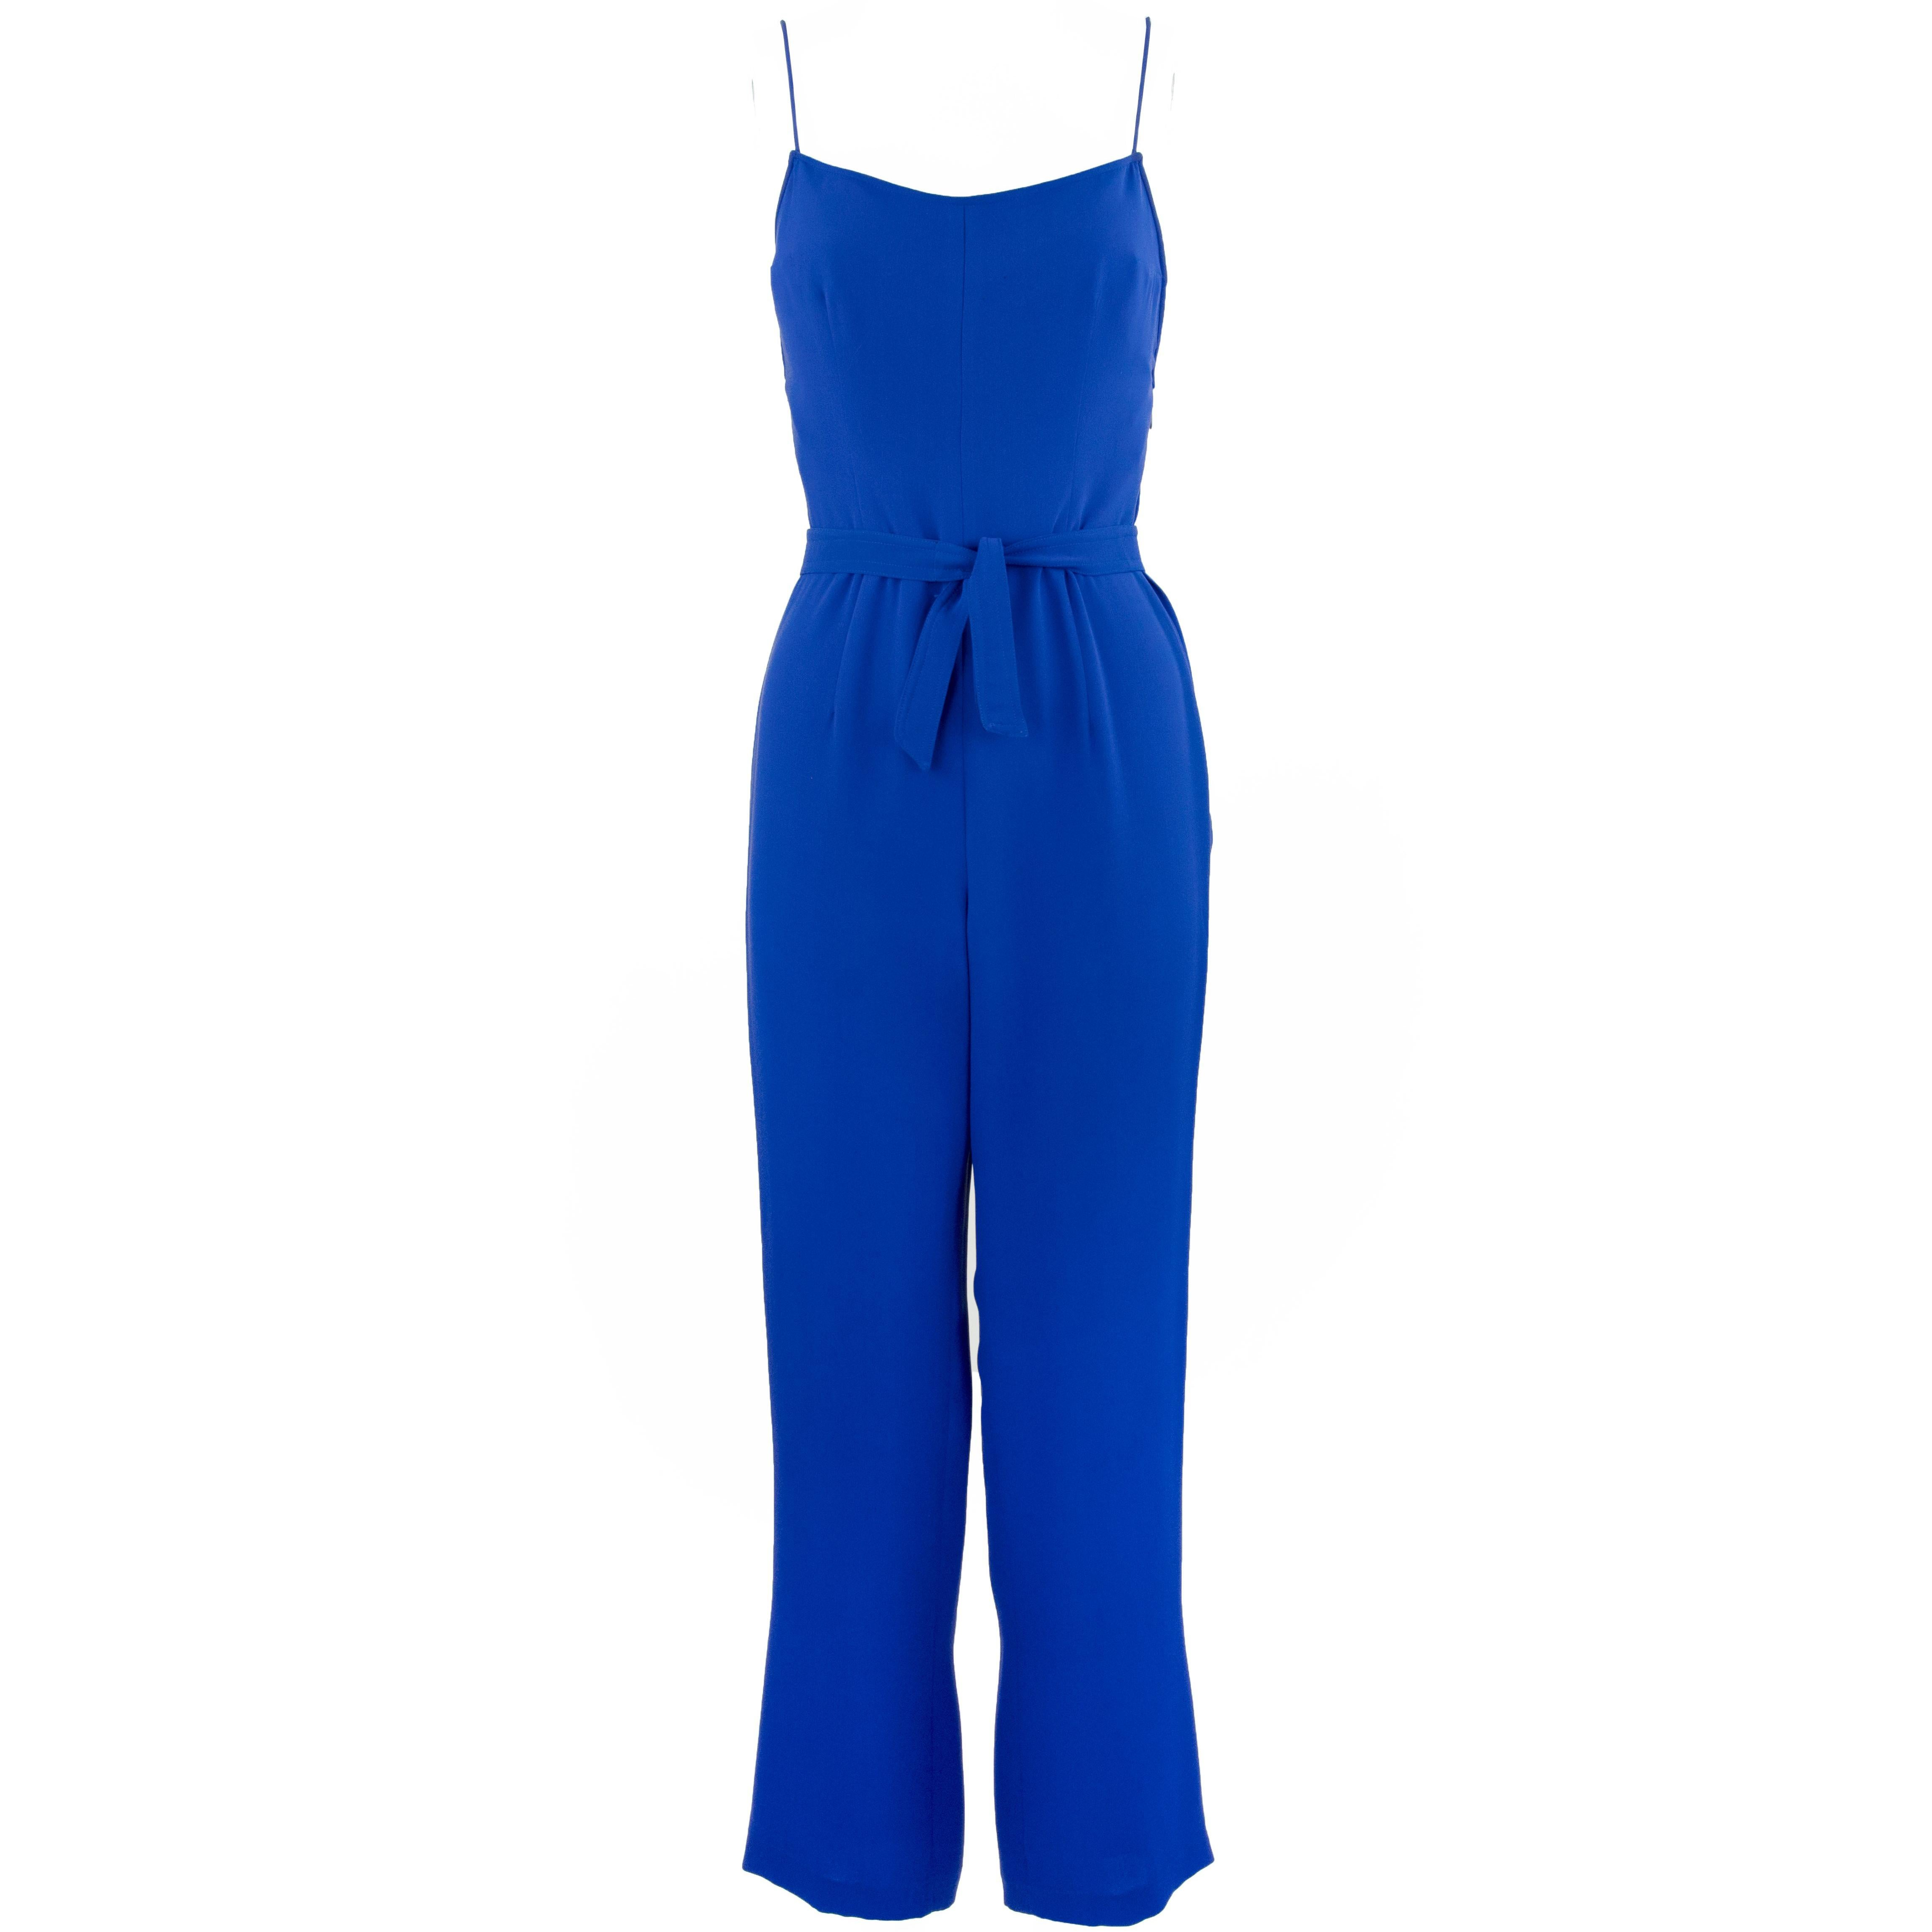 9feb35d57f8 Blue Jumpsuits - 58 For Sale on 1stdibs